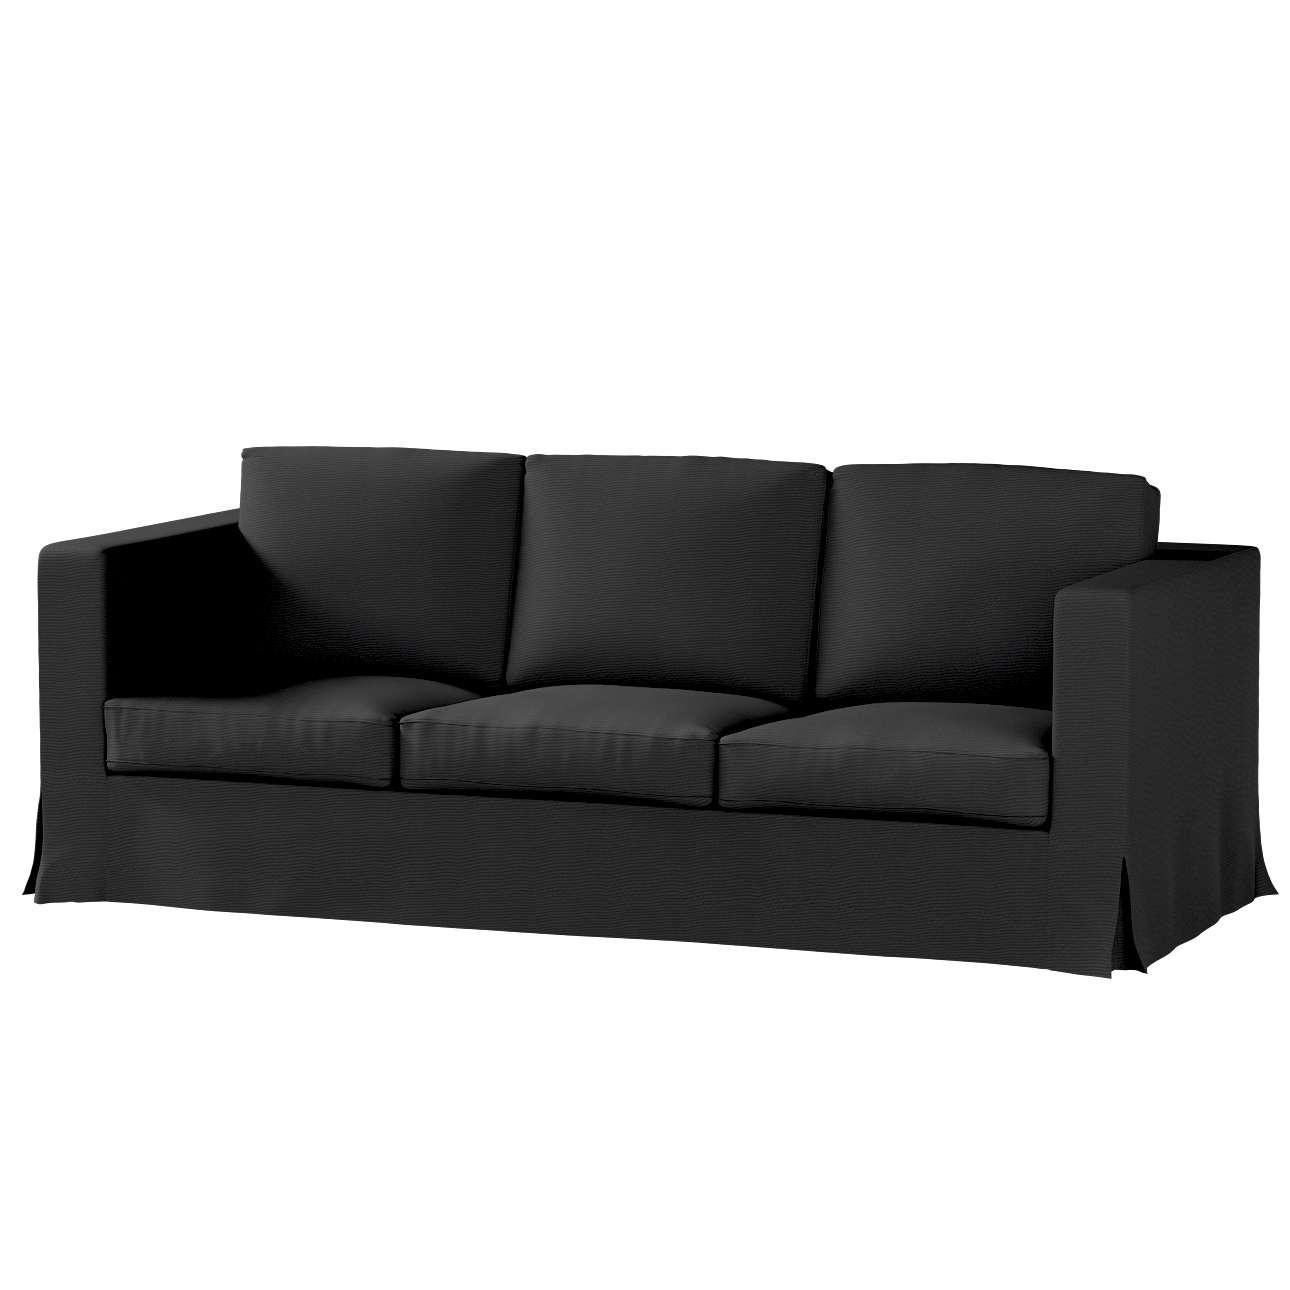 Karlanda 3-Sitzer  Sofabezug nicht ausklappbar lang Sofa Karlanda 3-lang von der Kollektion Etna, Stoff: 705-00